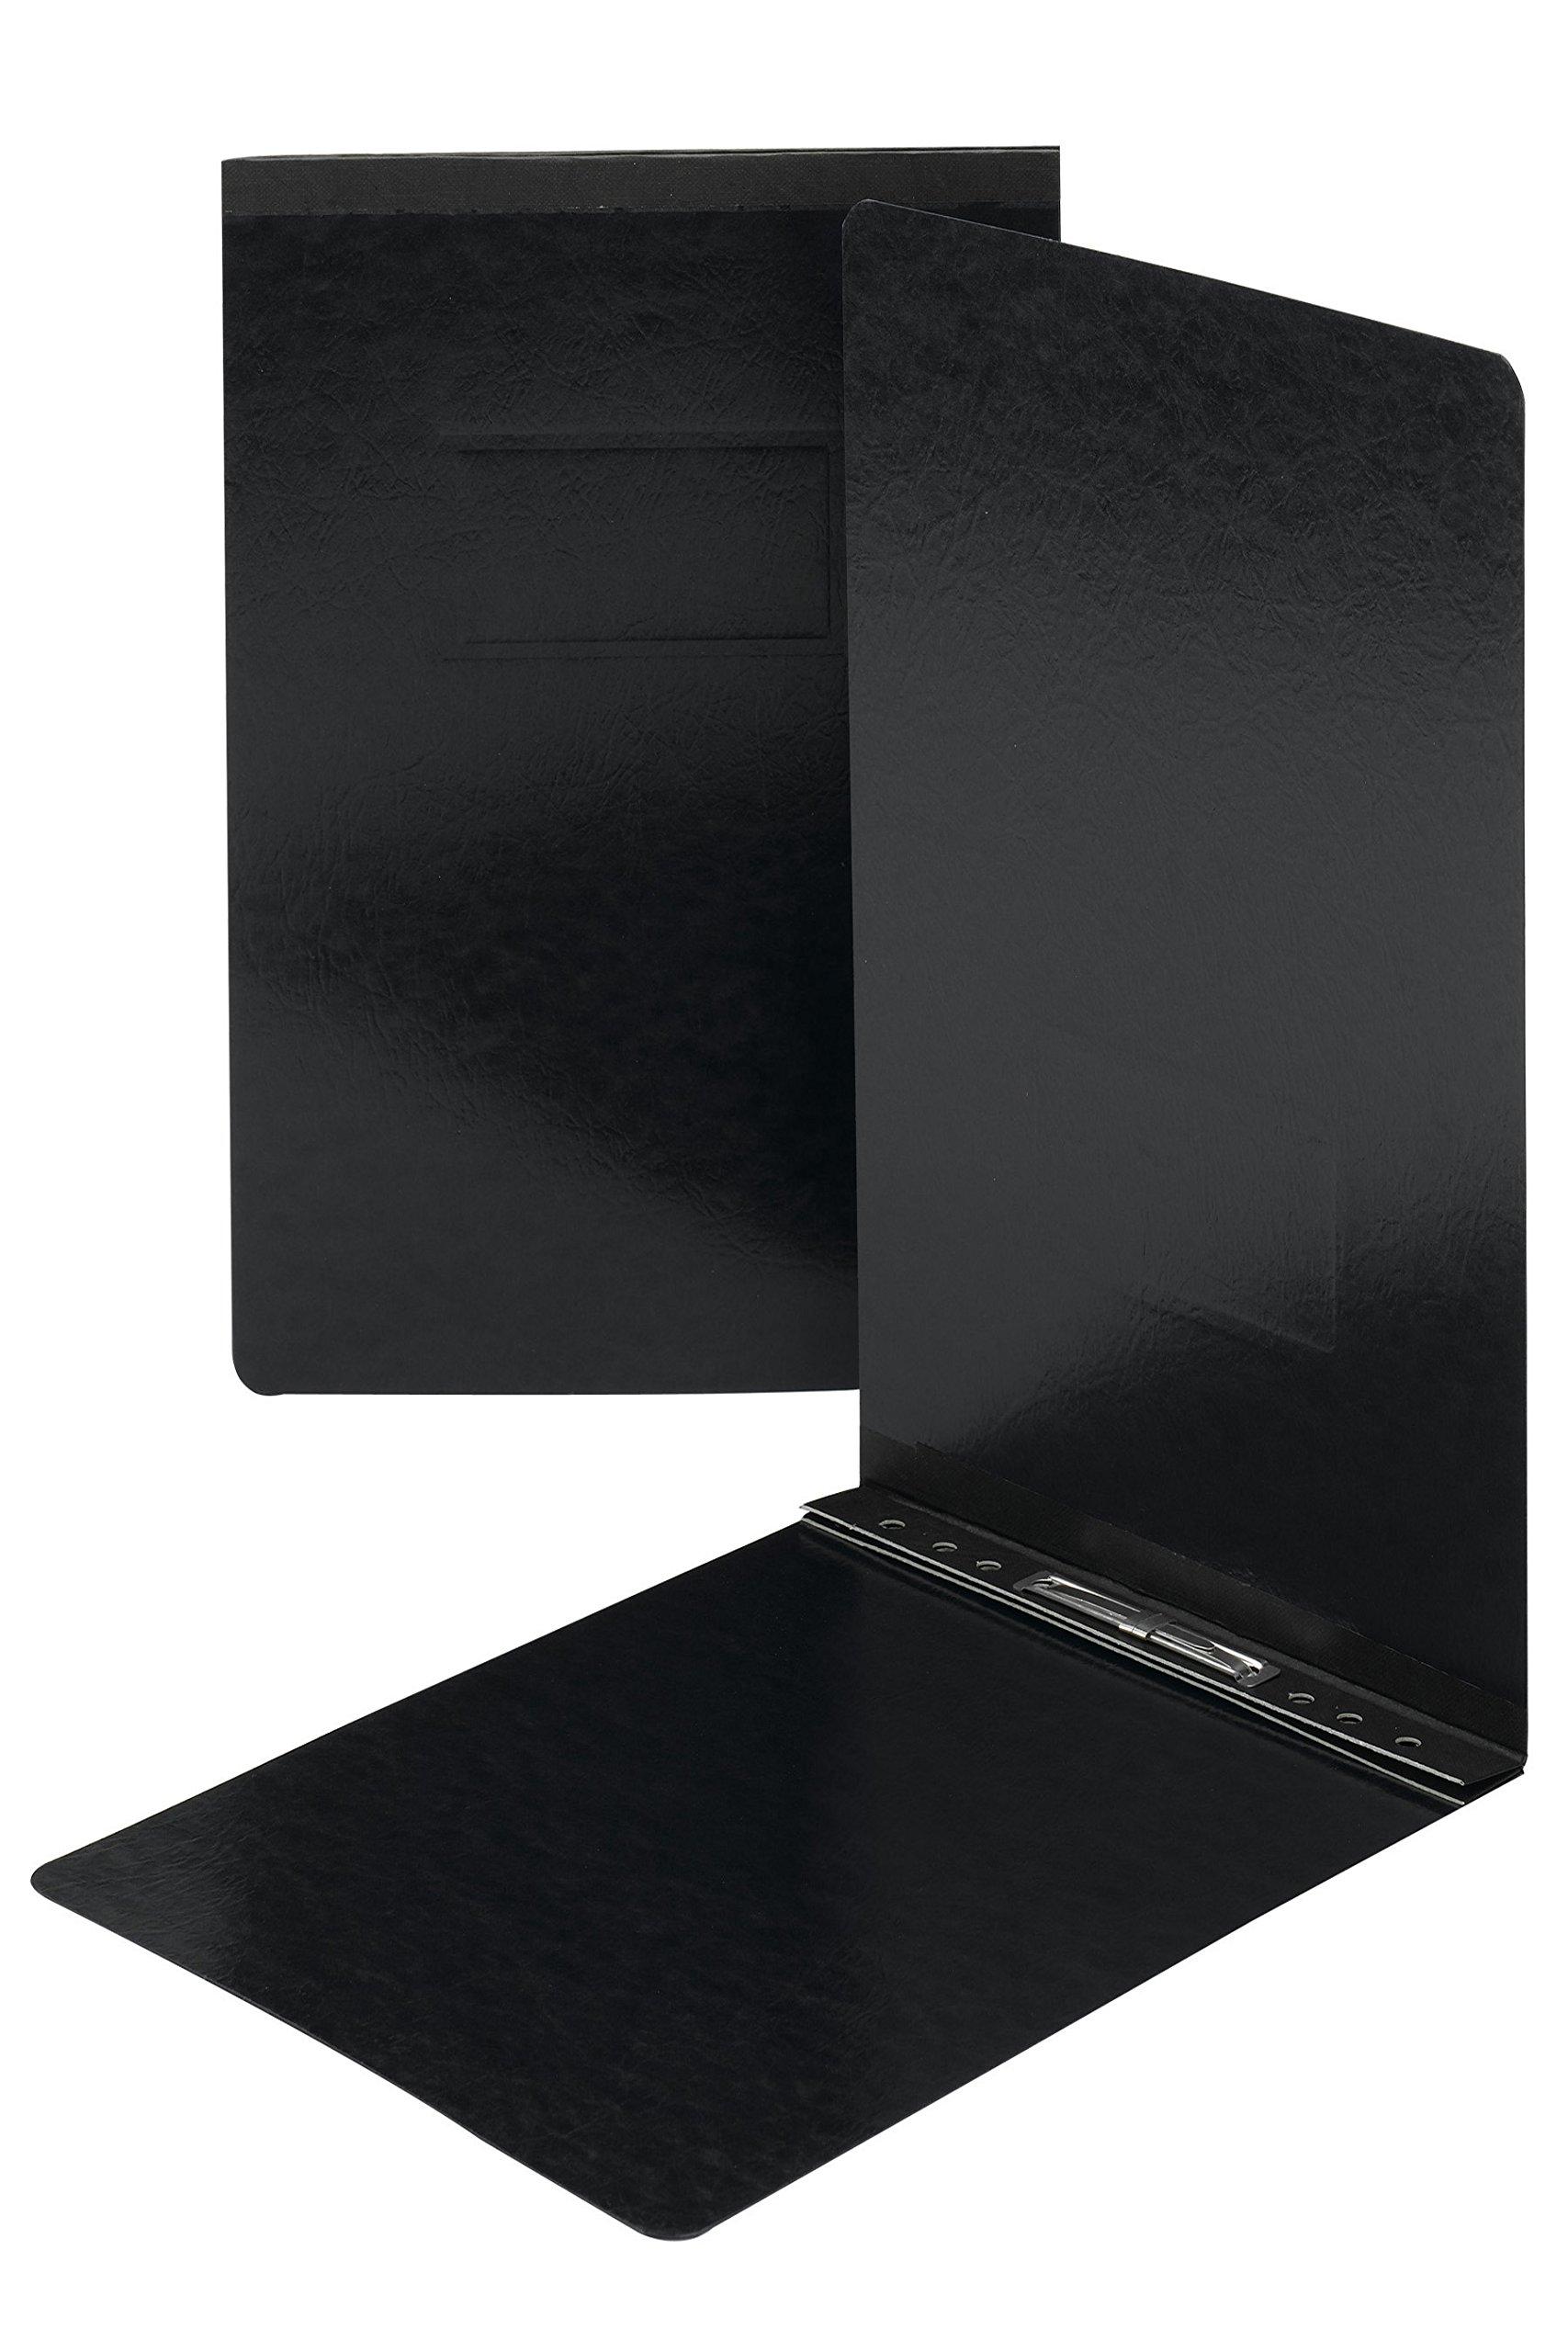 Smead Pressboard Report Cover, Metal Prong with Compressor, Top Fastener, 250 Sheets/2'' Capacity, Legal Size, Black, 25 per Box (81733)